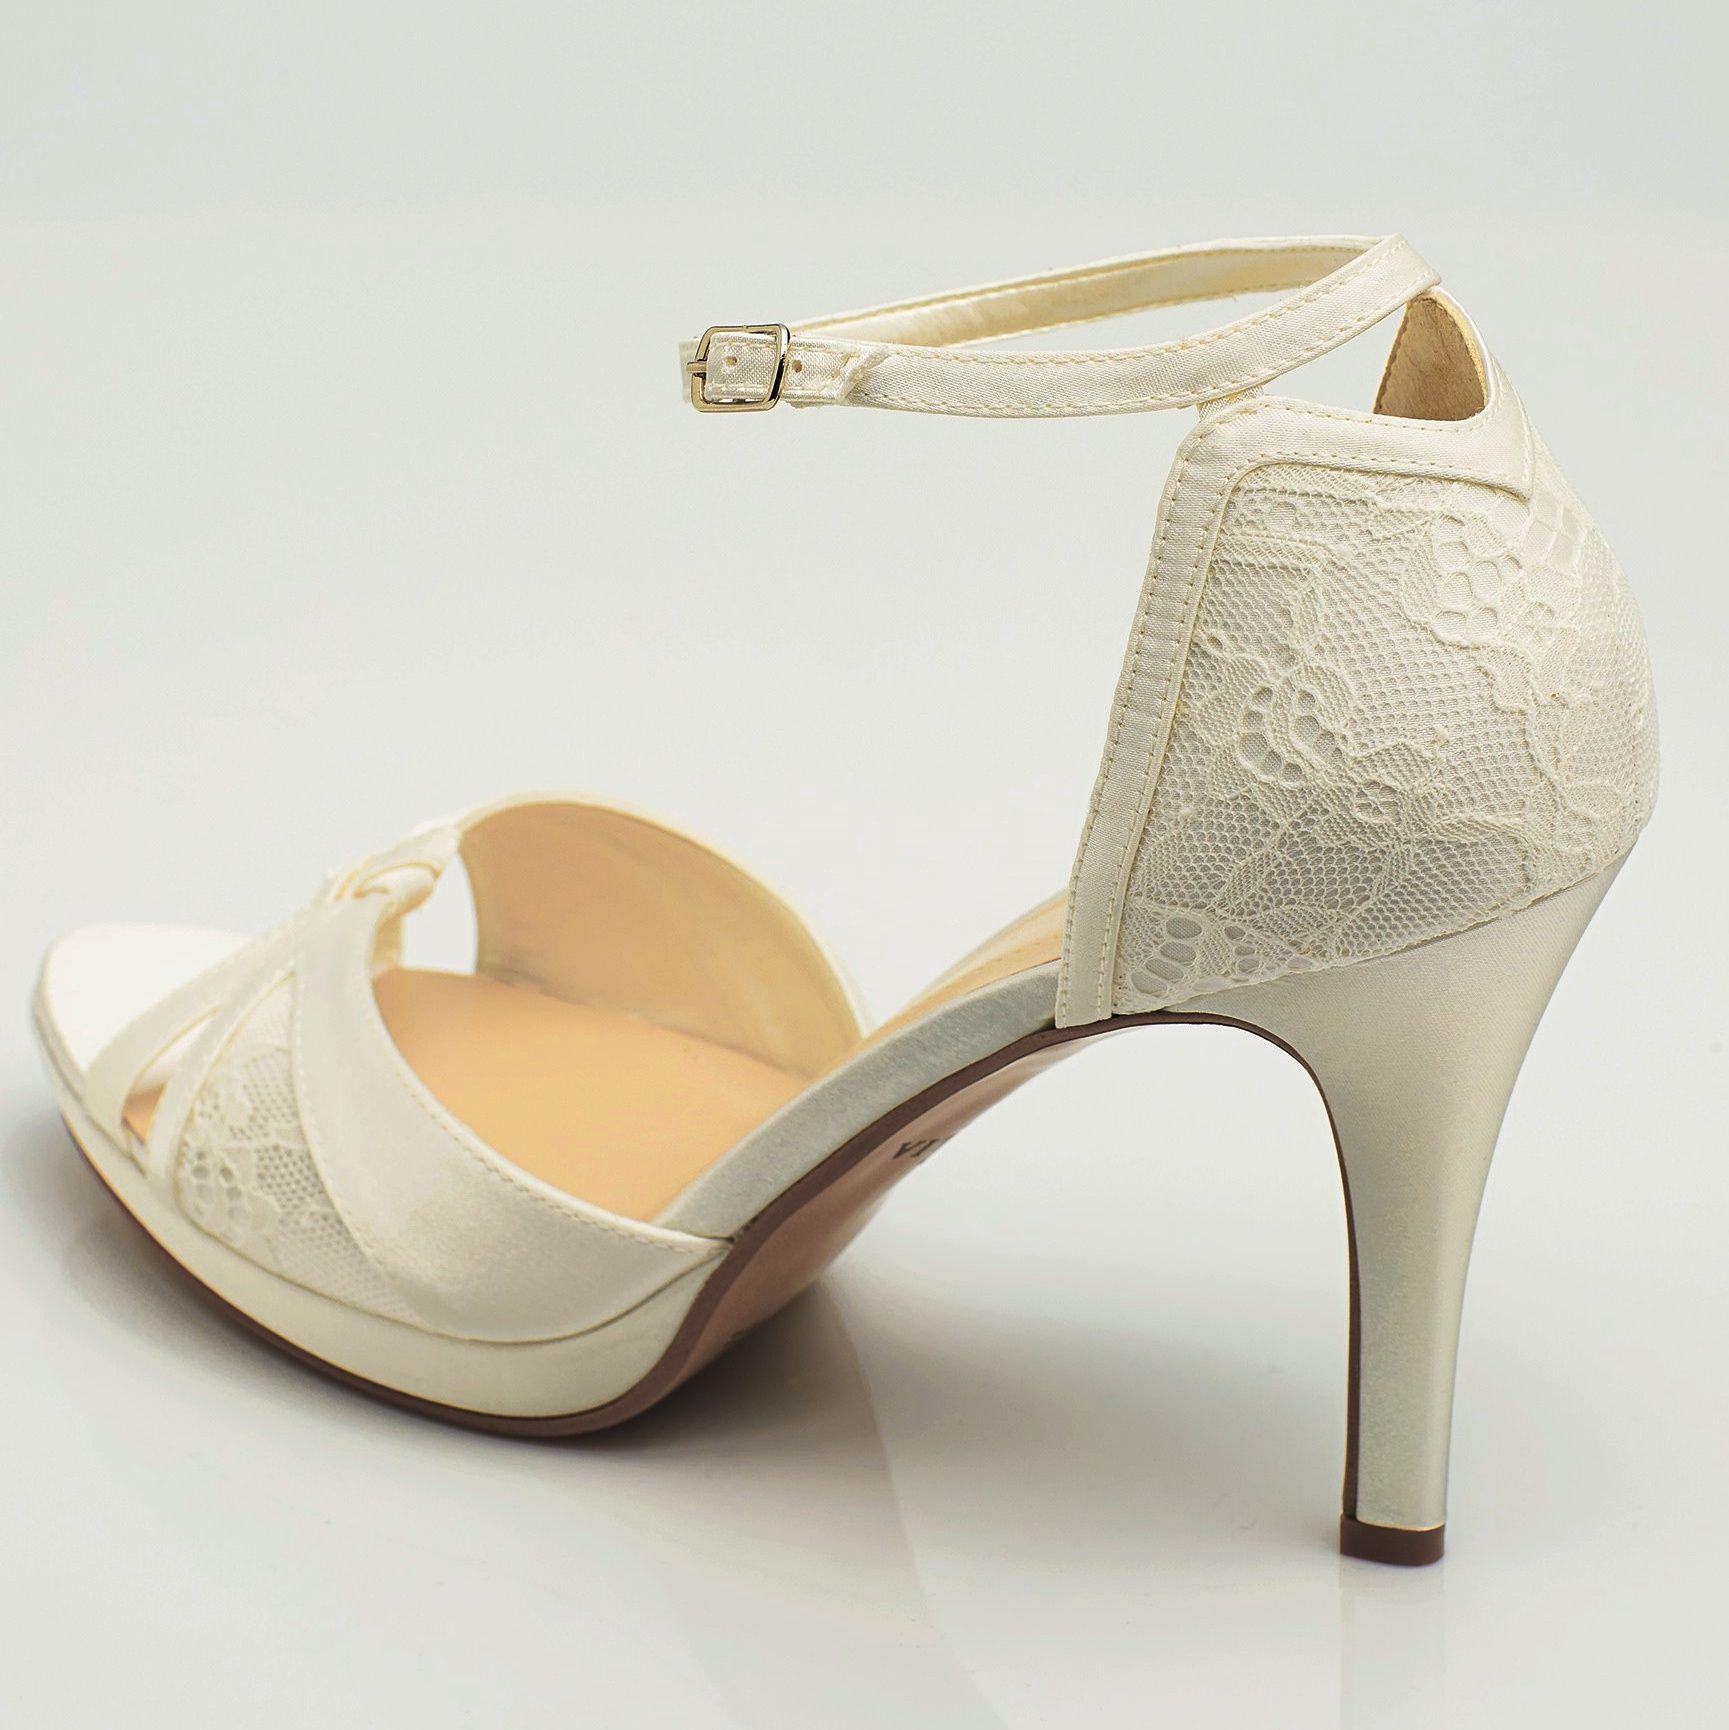 Zapatos de fiesta elegantes forrados. Sapatos de noiva com renda ... 8448bf287891